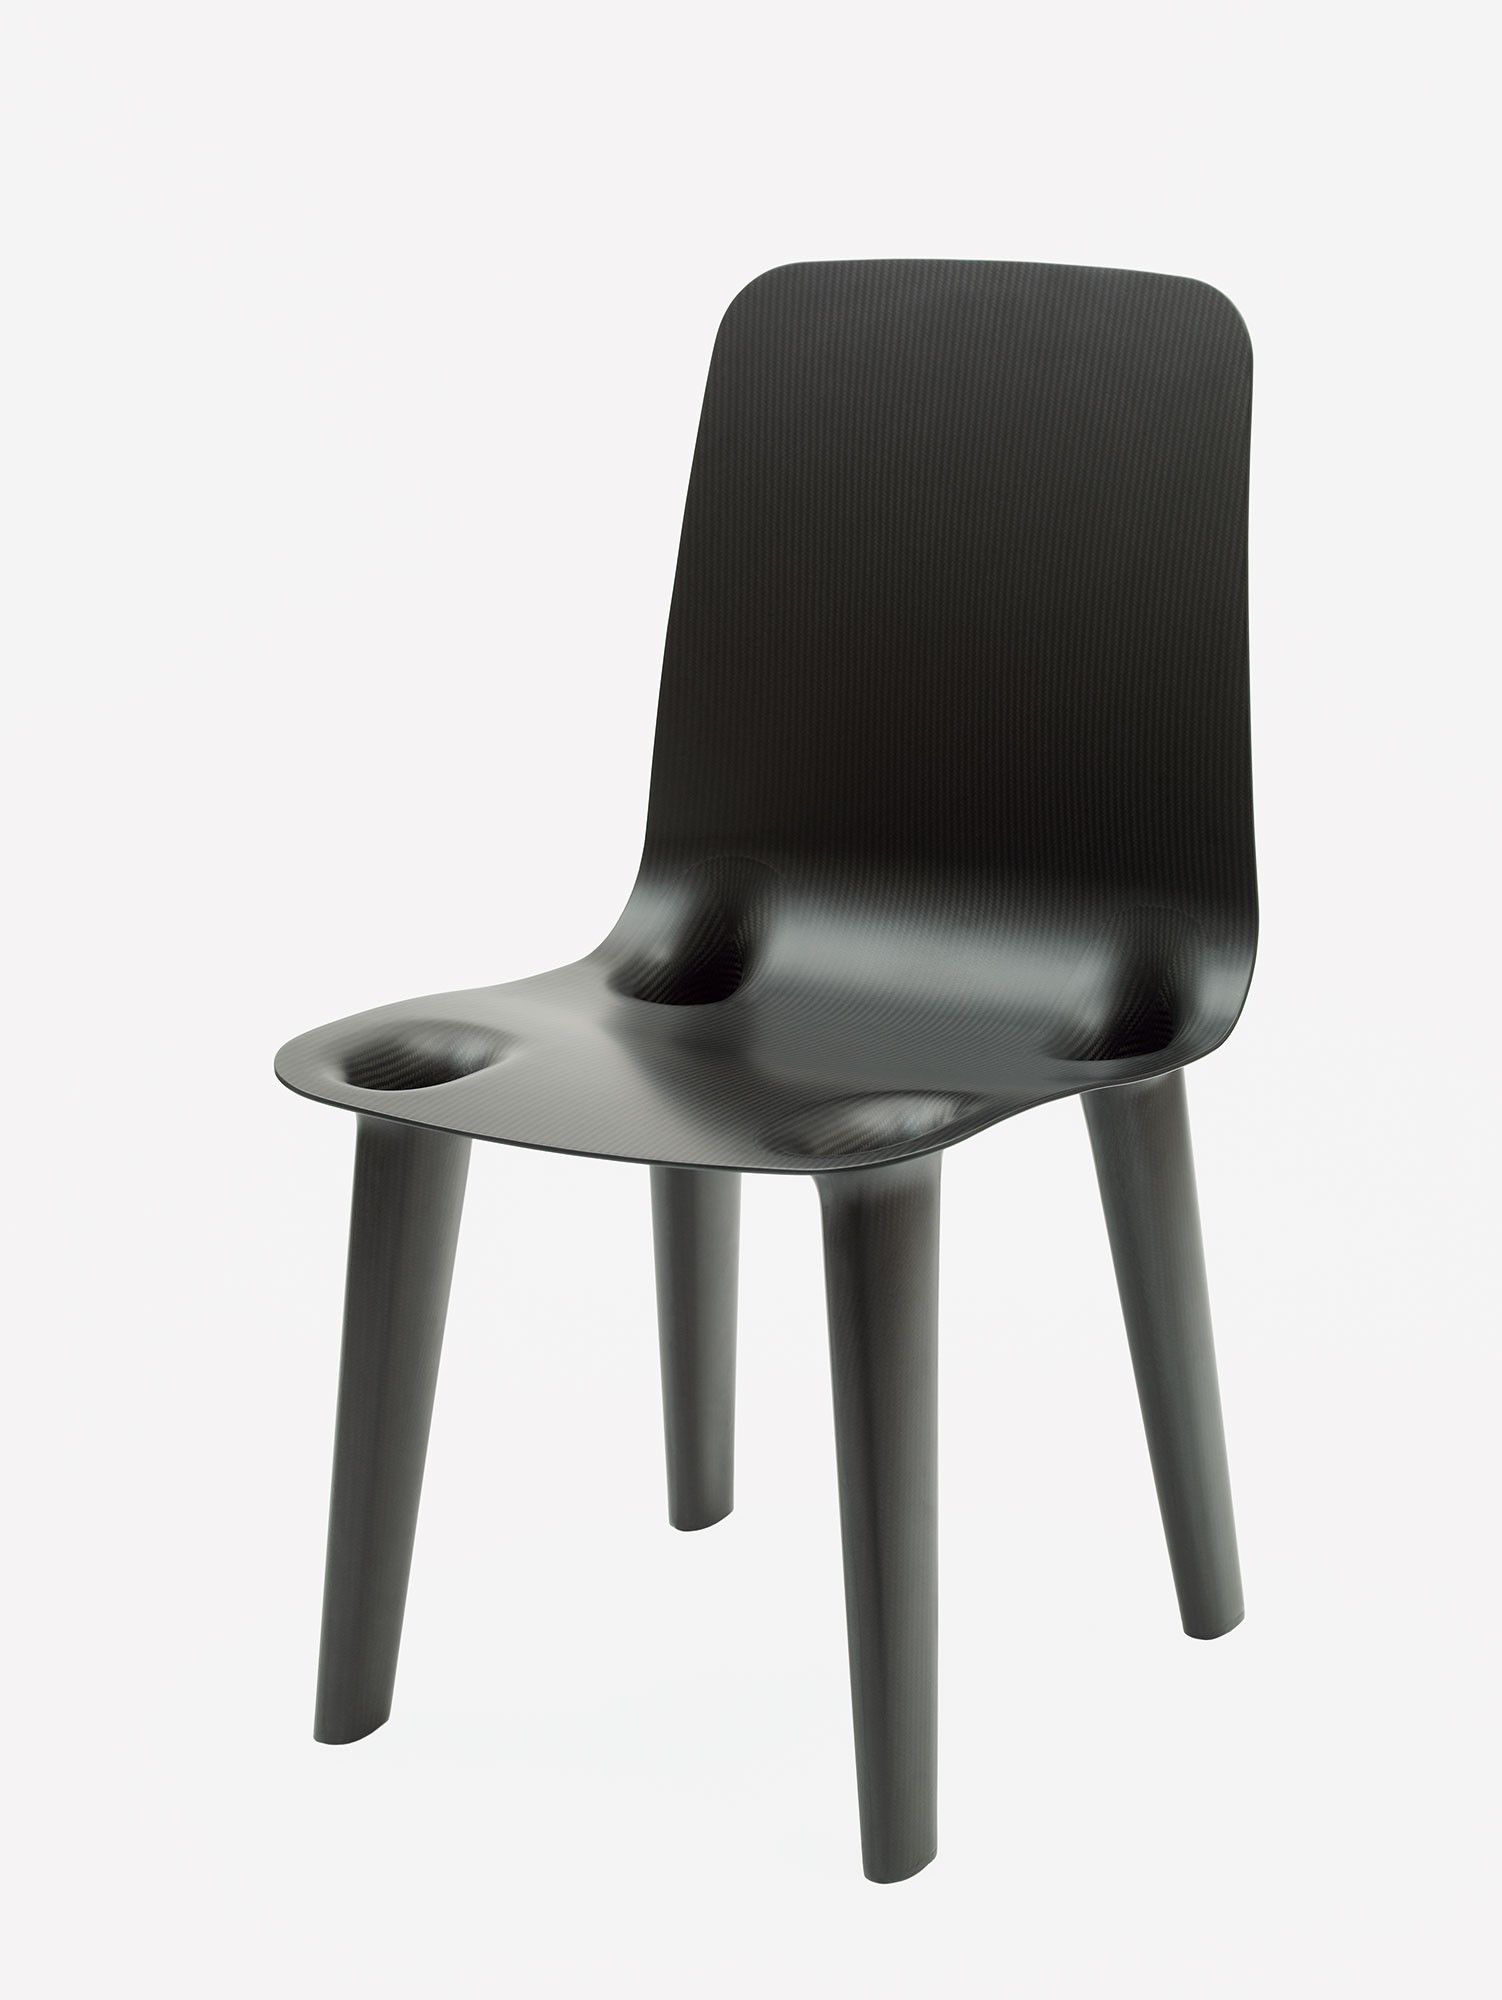 Jonathan Muecke Carbon Fiber Chair It looks like nori Furniture & Housewares Pinterest